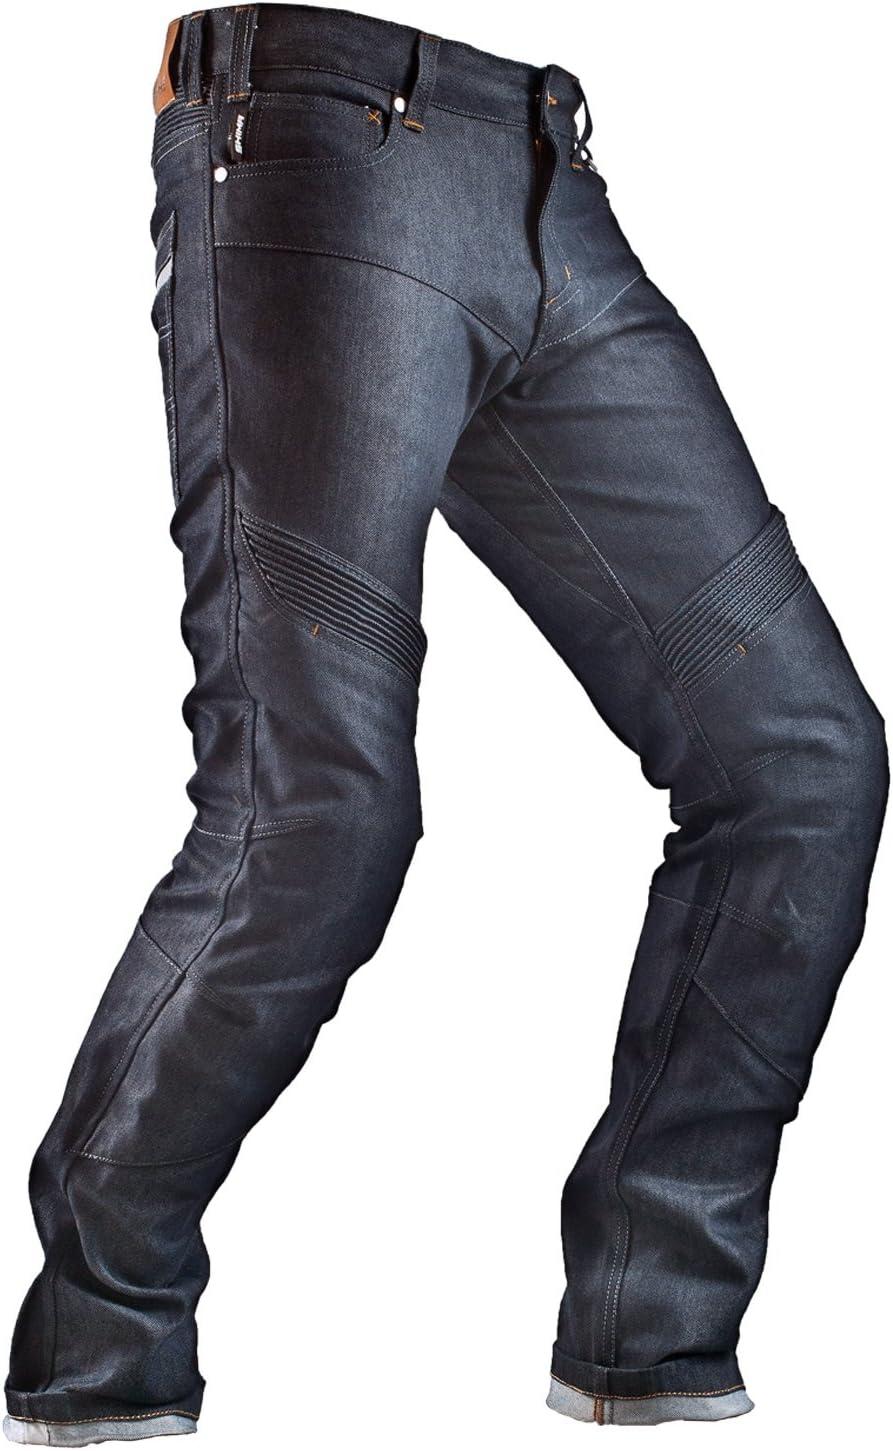 Shima Gravity Cordura Classic Protektoren Herren Gusset Motorrad Jeans Blue Größe 34 Long Blau 34 Lang Gravity 34l Auto